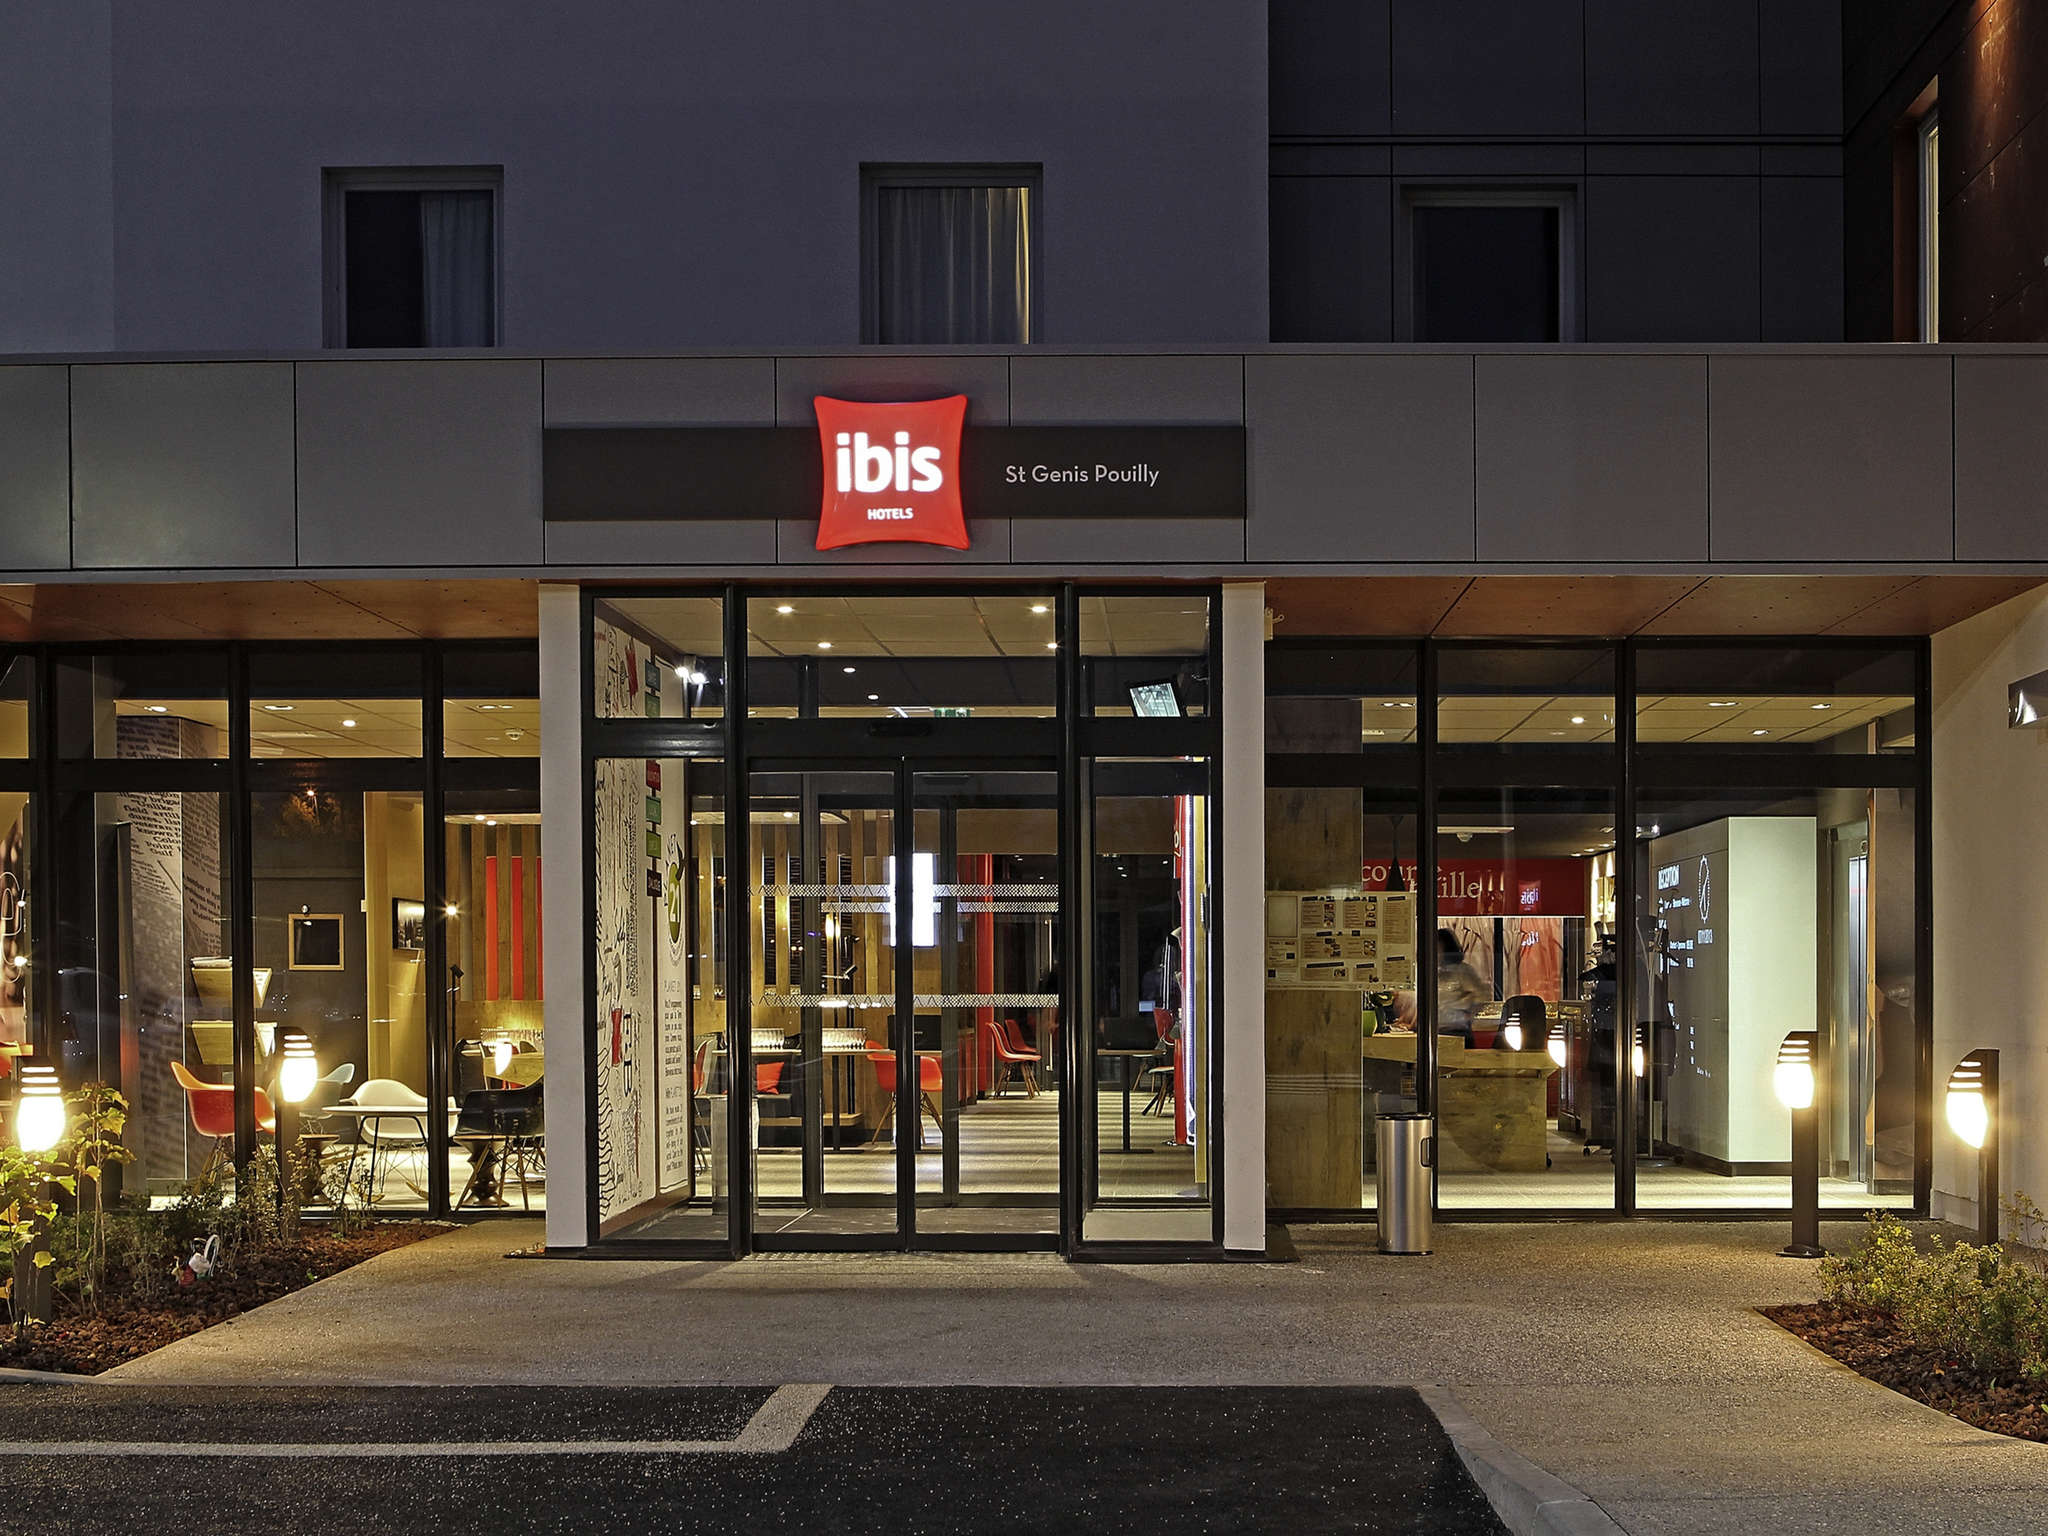 Hotel - ibis Saint Genis Pouilly Genève